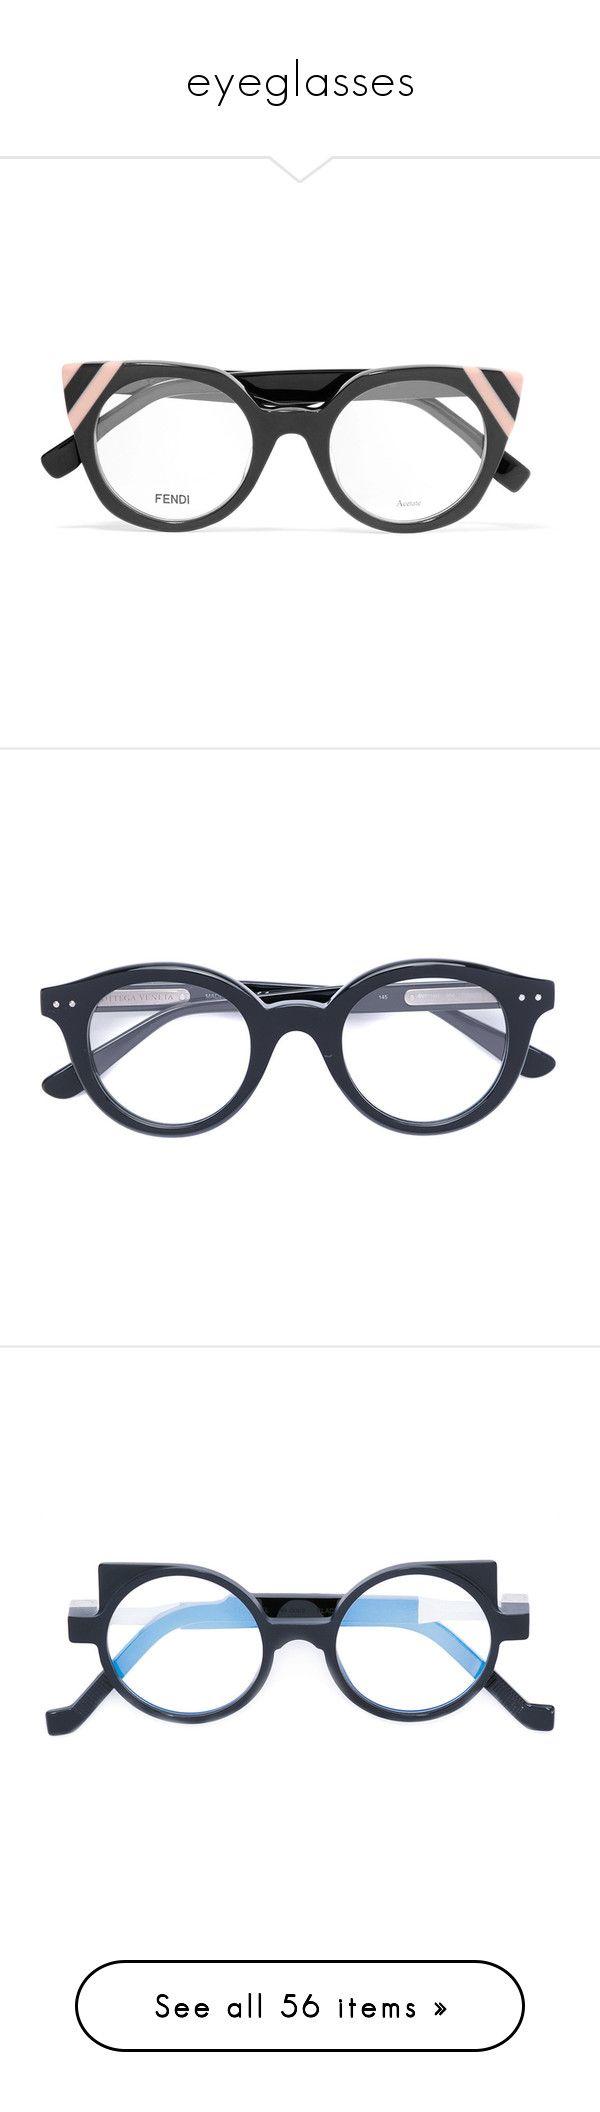 """eyeglasses"" by caterinabi ❤ liked on Polyvore featuring accessories, eyewear, eyeglasses, glasses, grey, cat eye glasses, acetate glasses, cat eye eyeglasses, fendi eyewear and acetate eyeglasses"